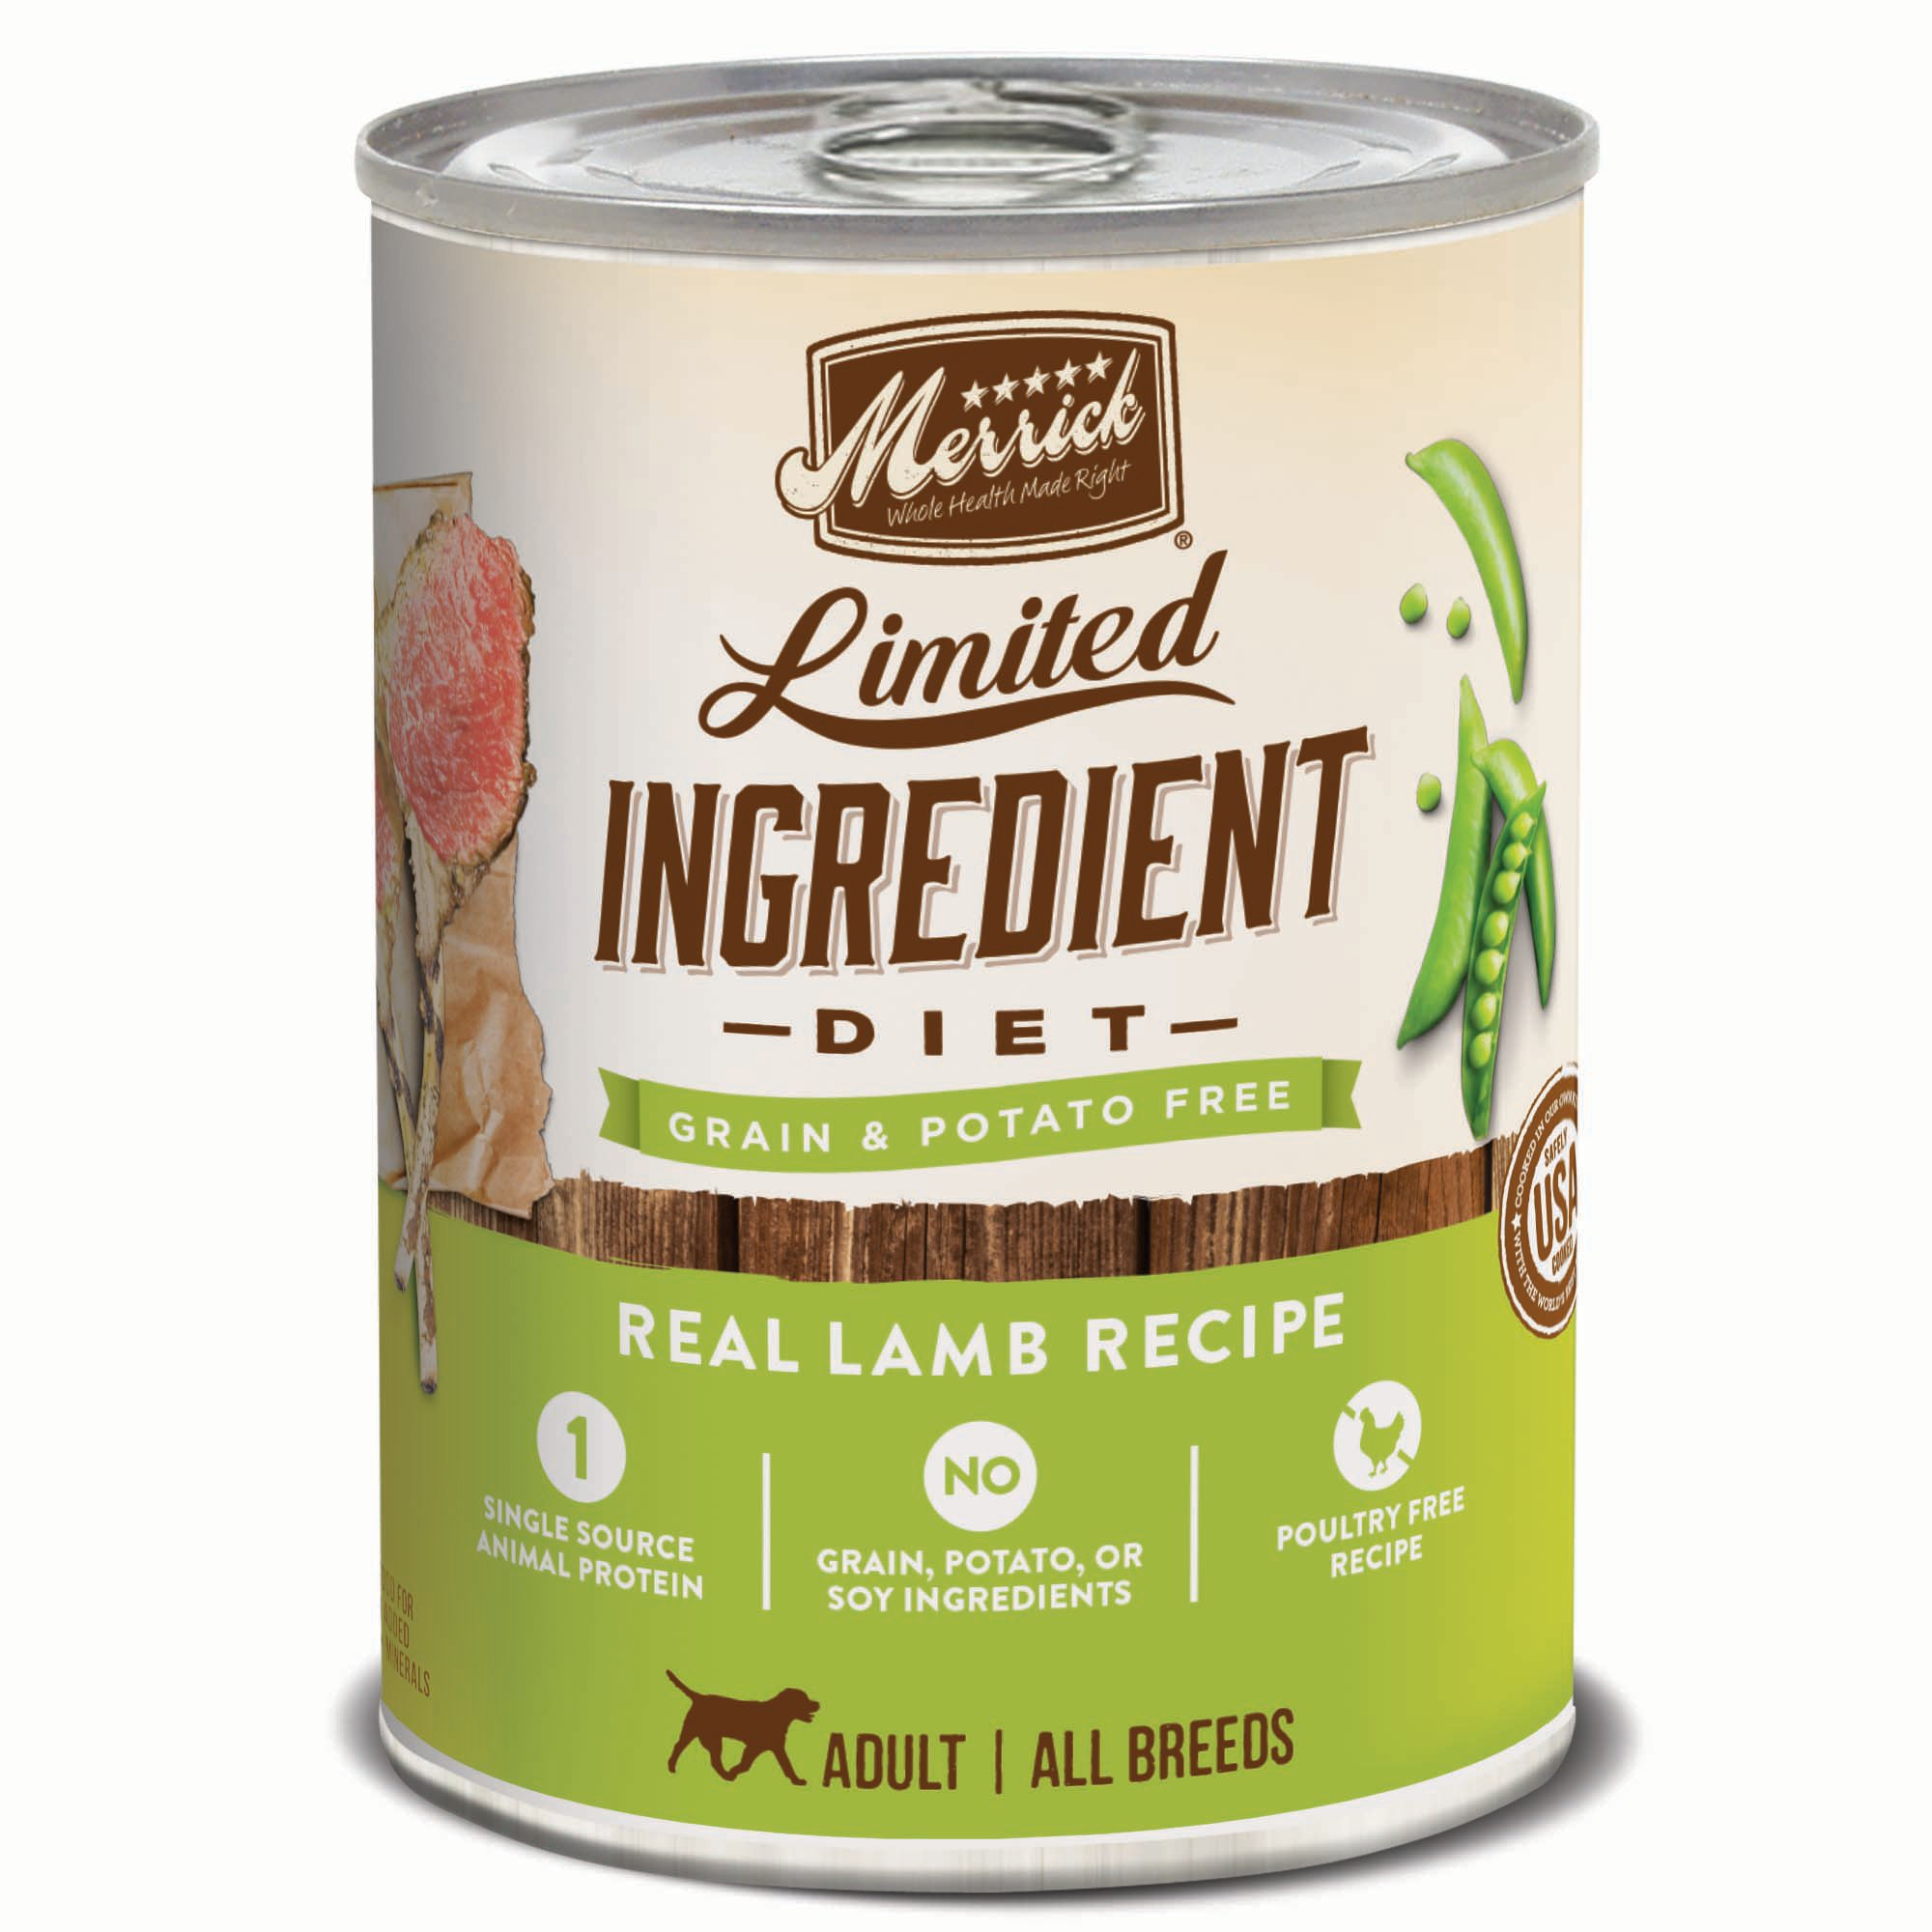 Wellness Canned Dog Food Petco